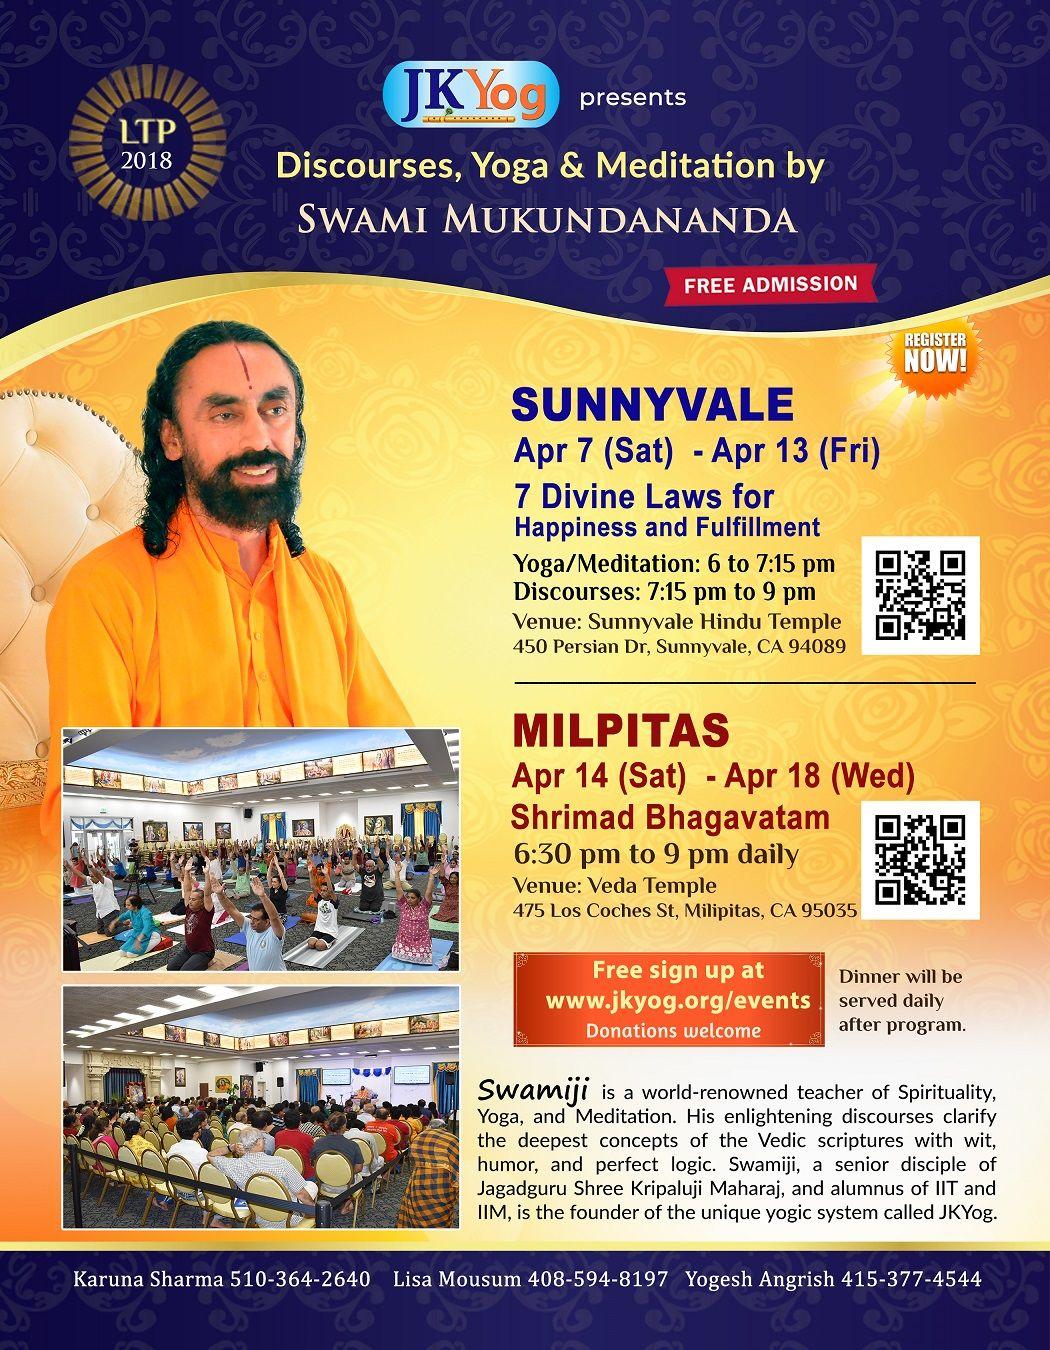 Shrimad Bhagavatam by Swami Mukundananda